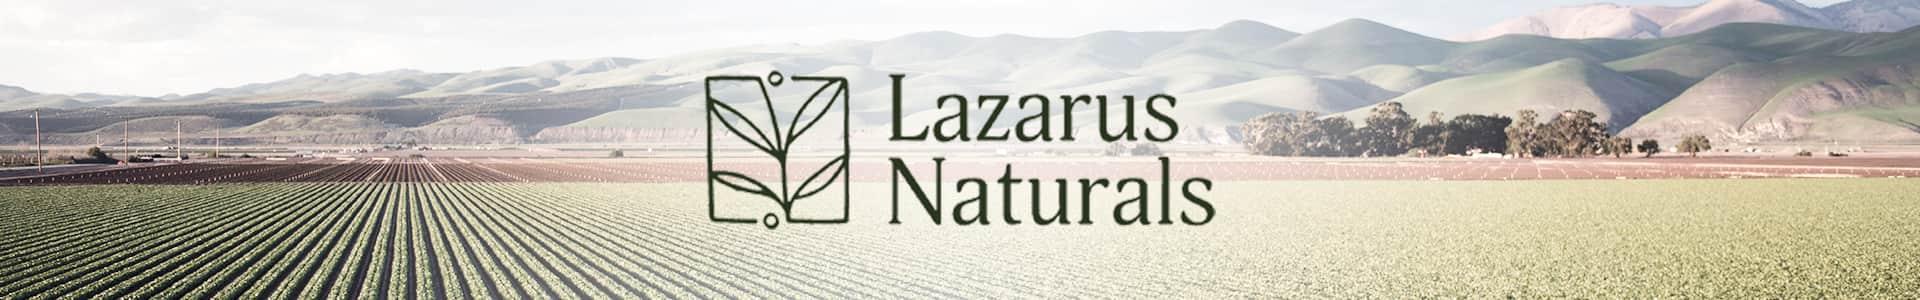 Lazarus Naturals CBD Products